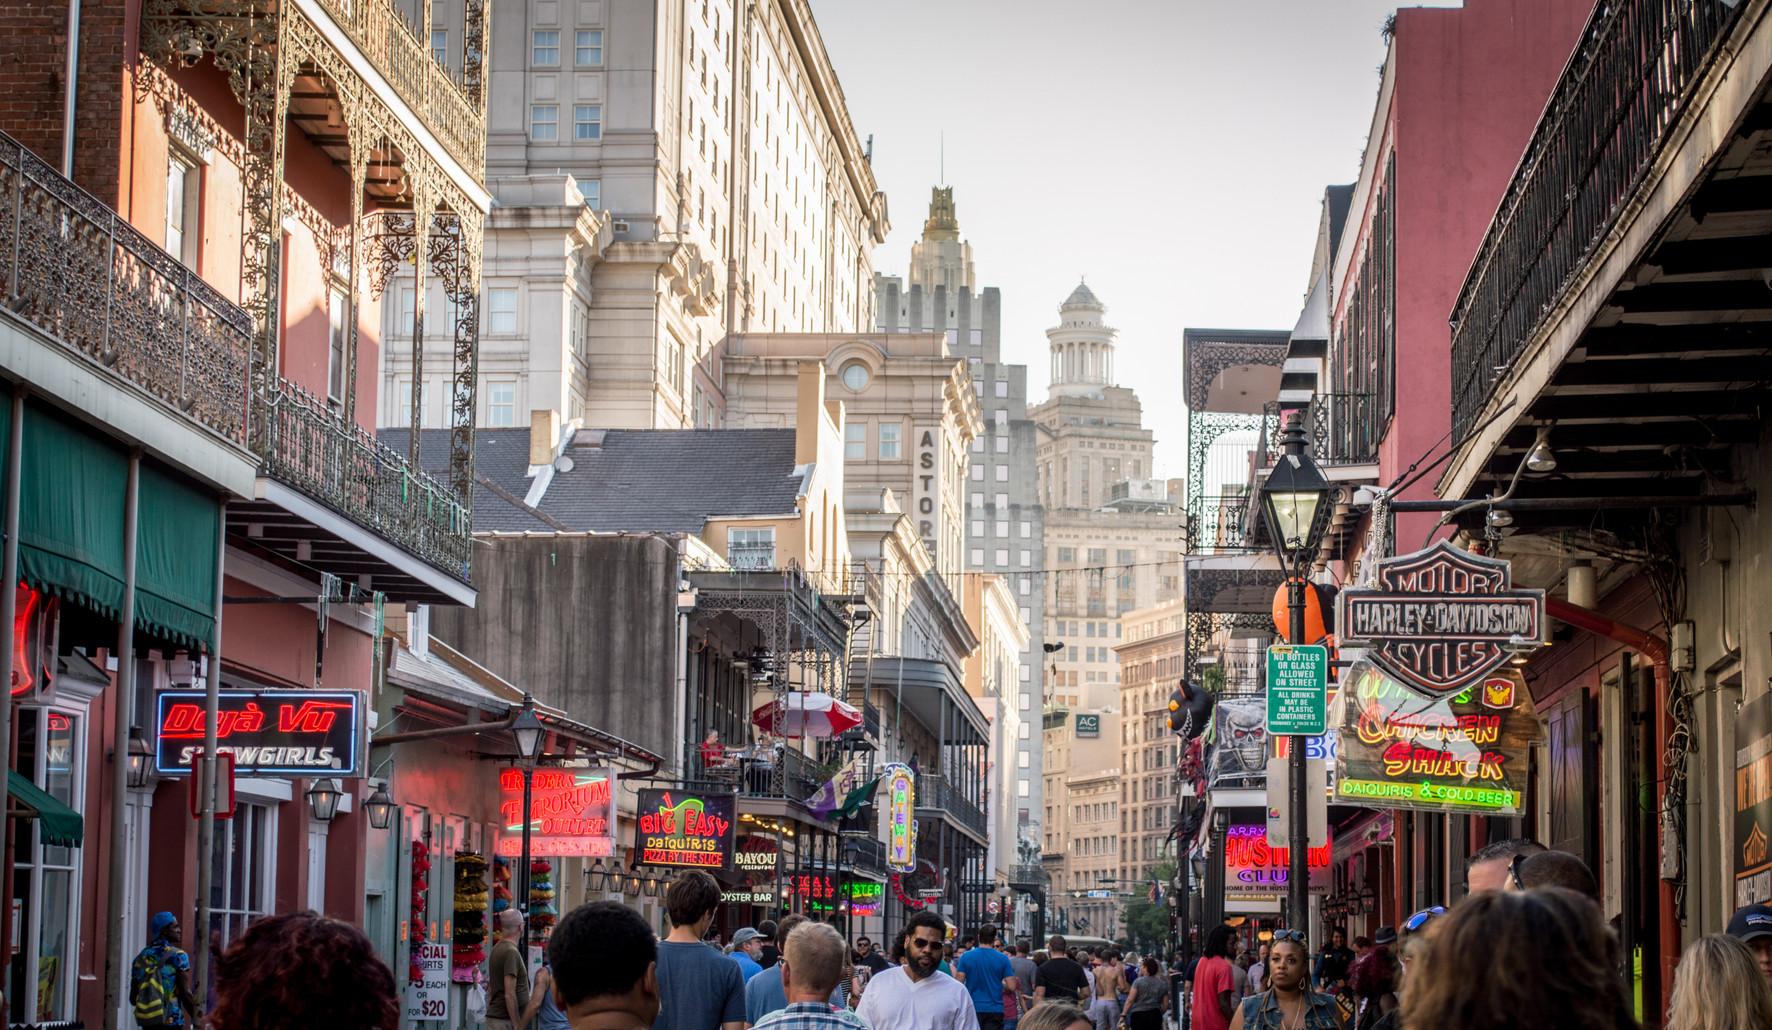 Bourbon Street towards downtown, New Orleans